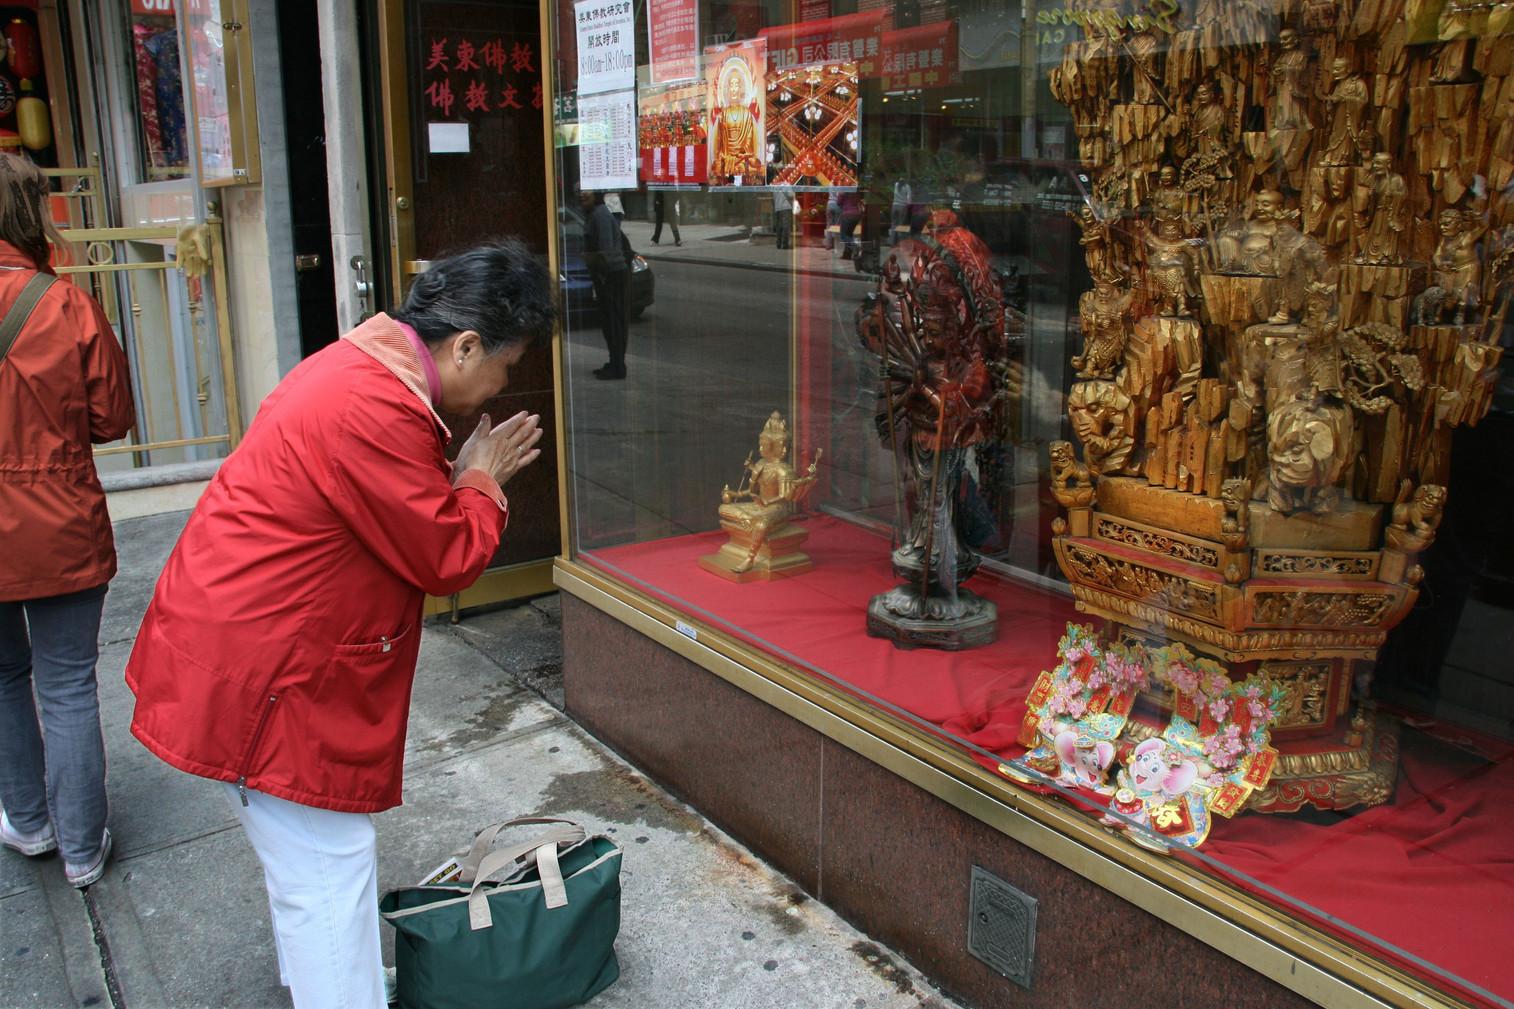 02_New York Polyphony, 2008, Fotografie,